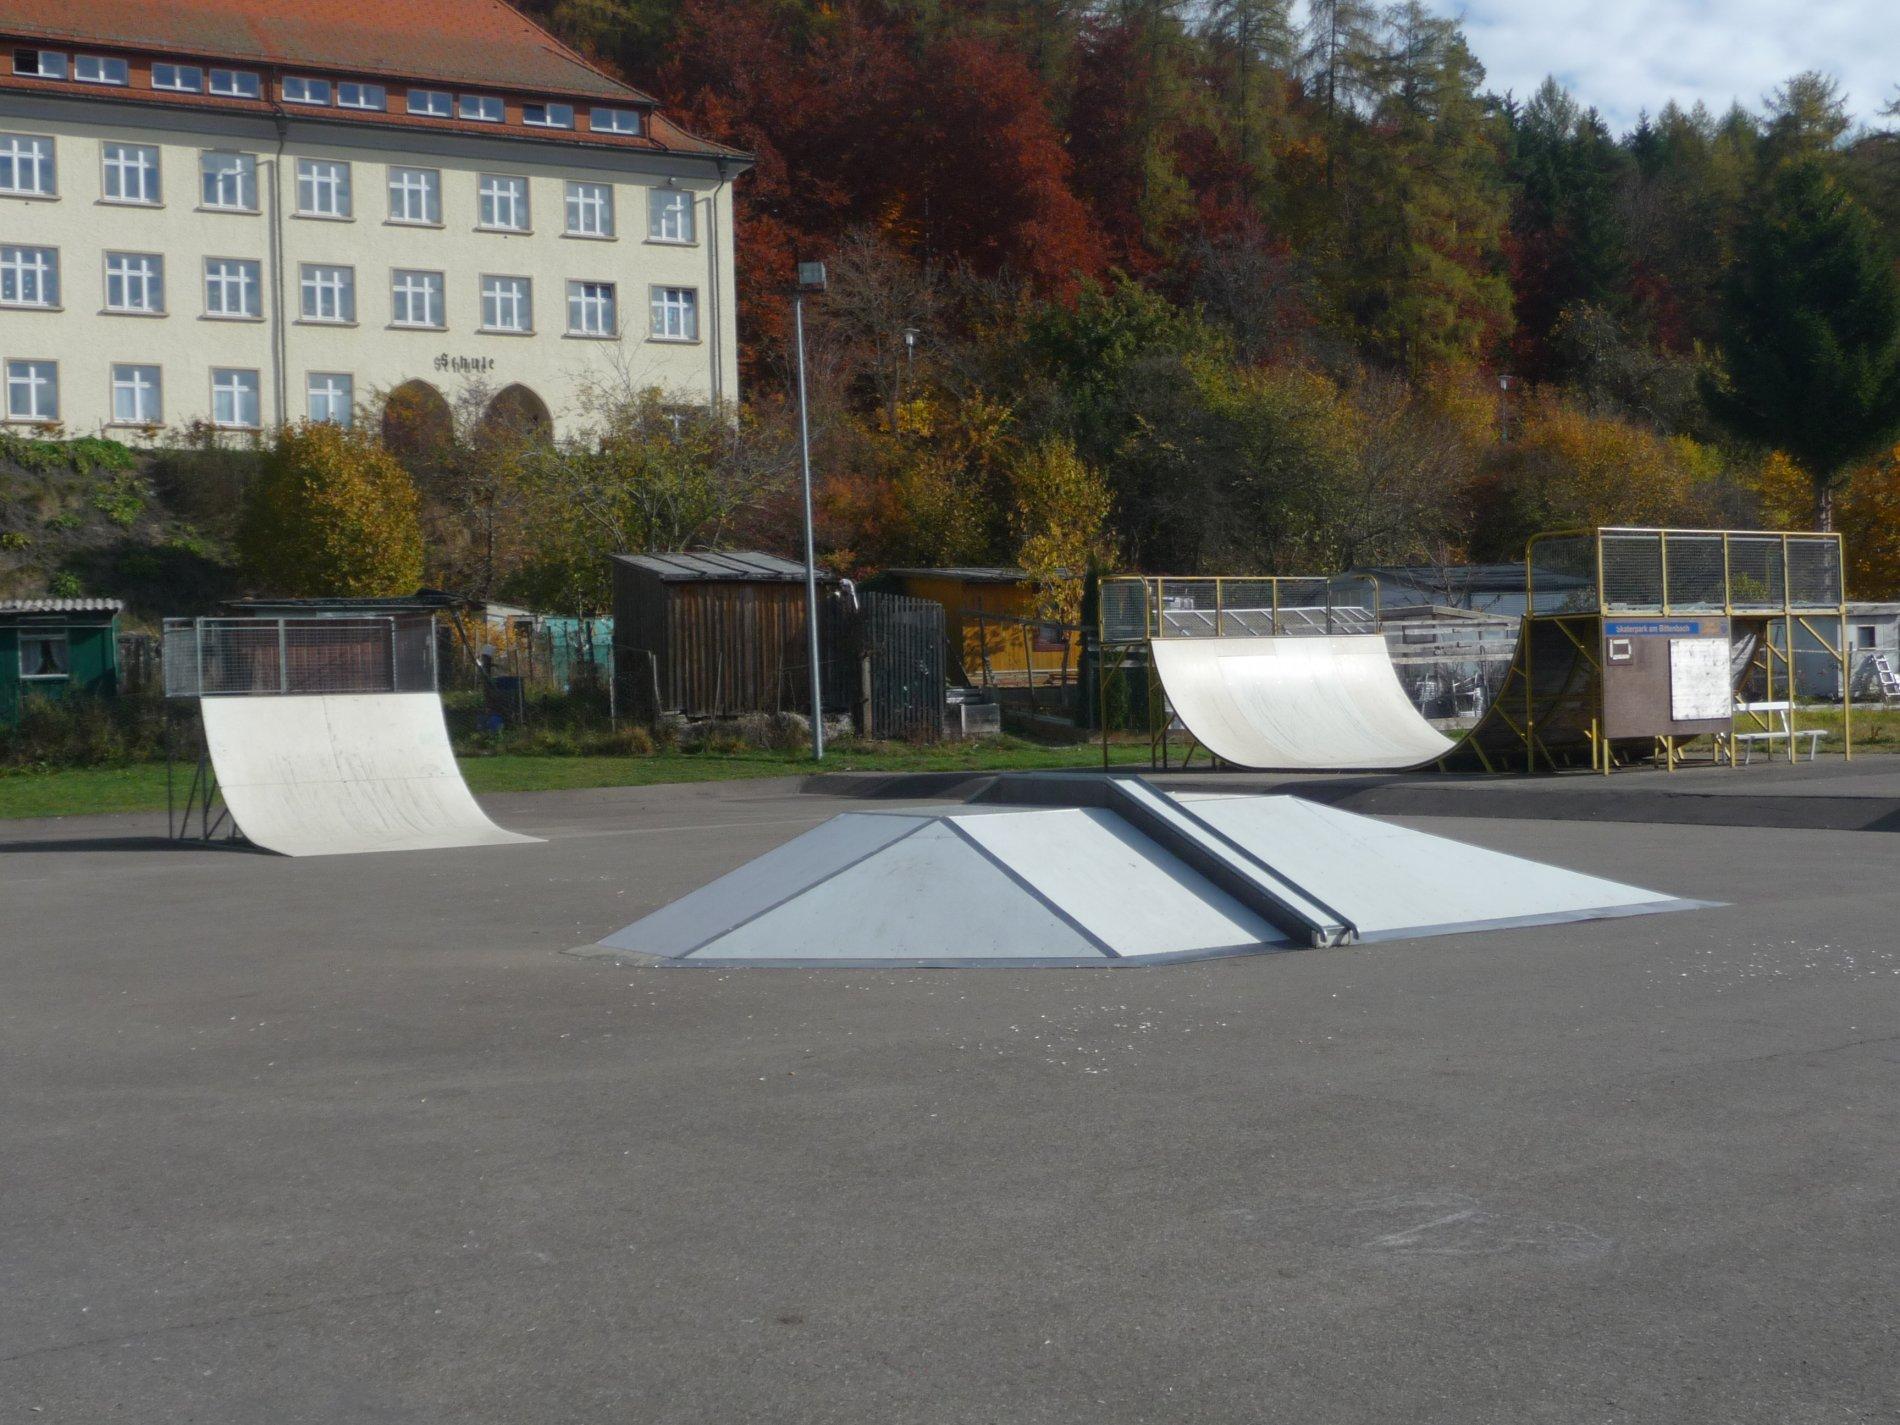 weitläufiger Skaterpark